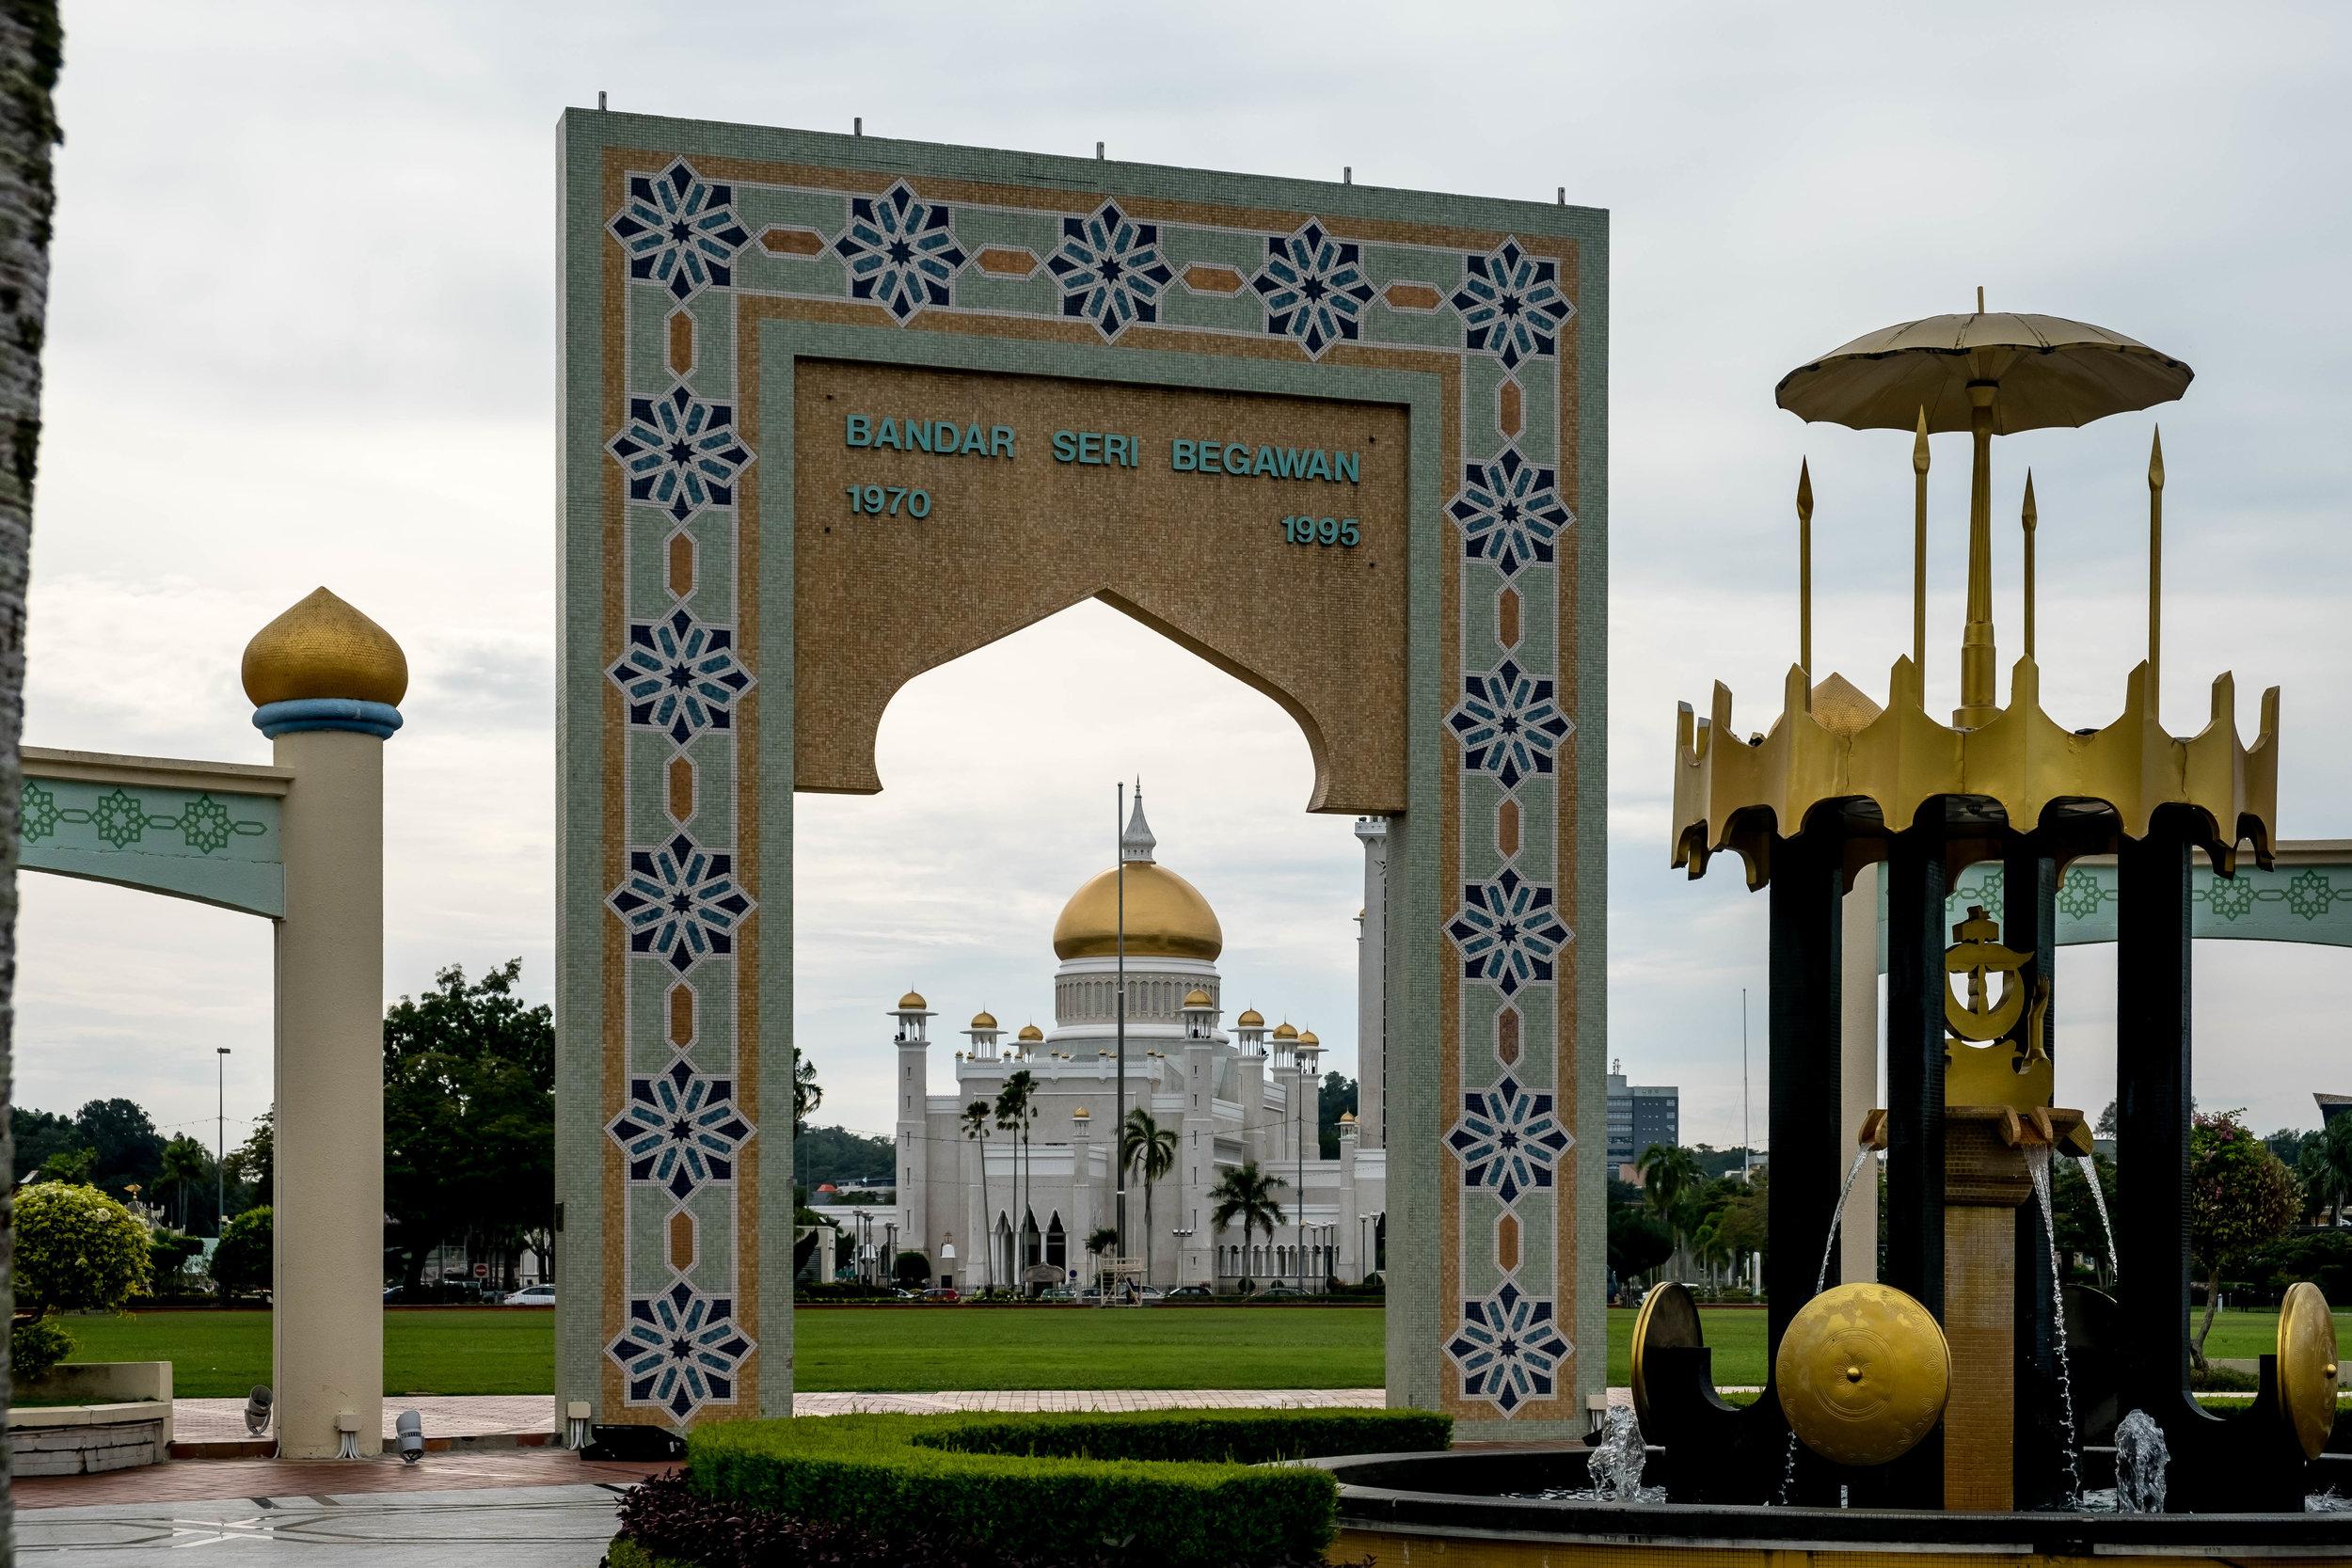 Bandar Seri Begawan - capital of Brunei